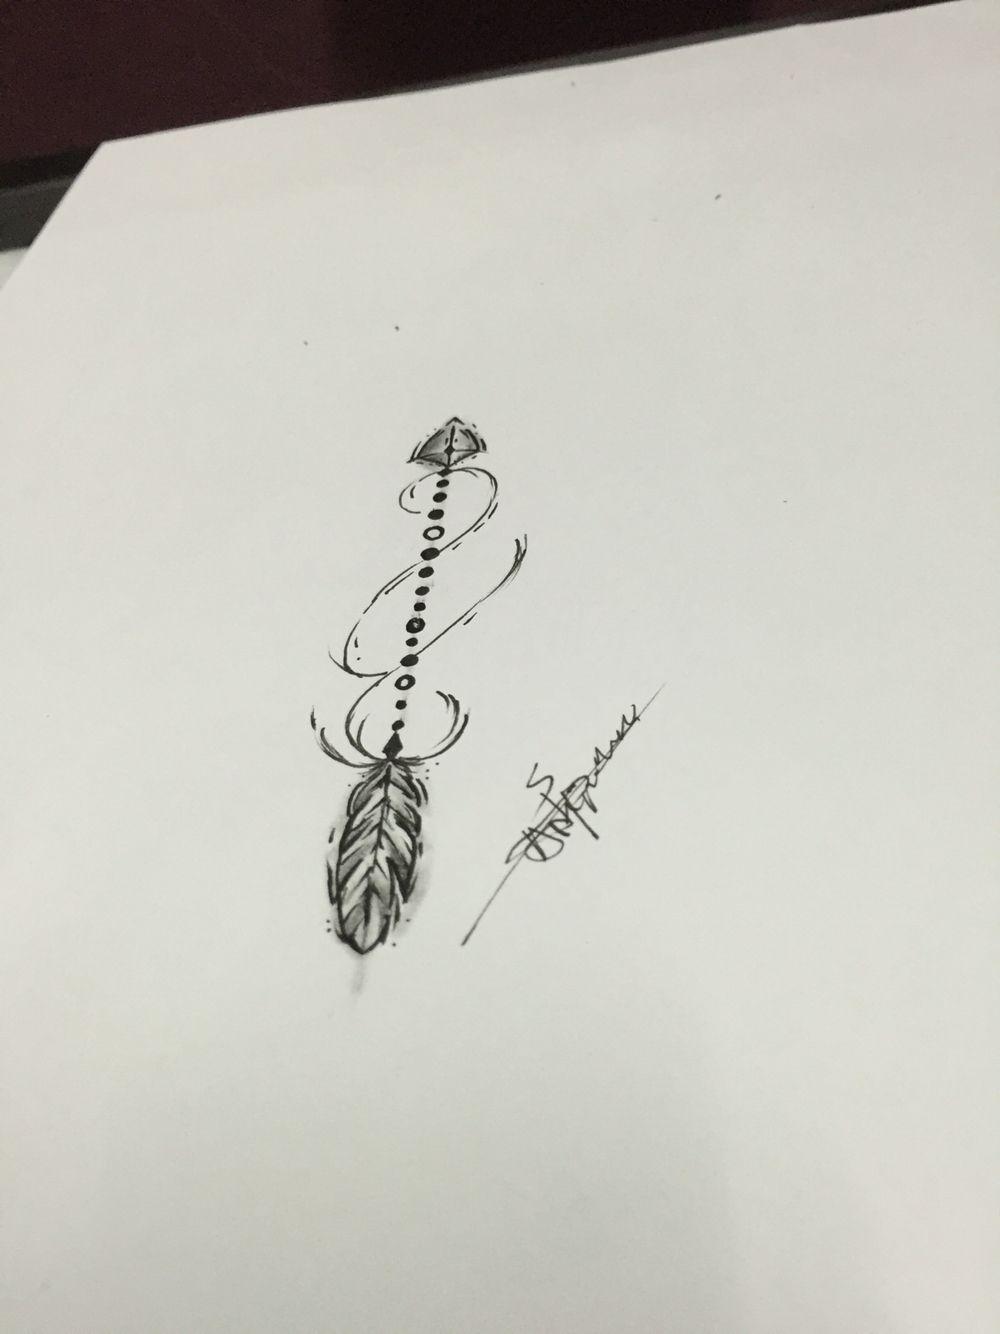 aeb679df693bb Abstract arrow tattoo design | Drawings | Arrow tattoo design, Arrow ...